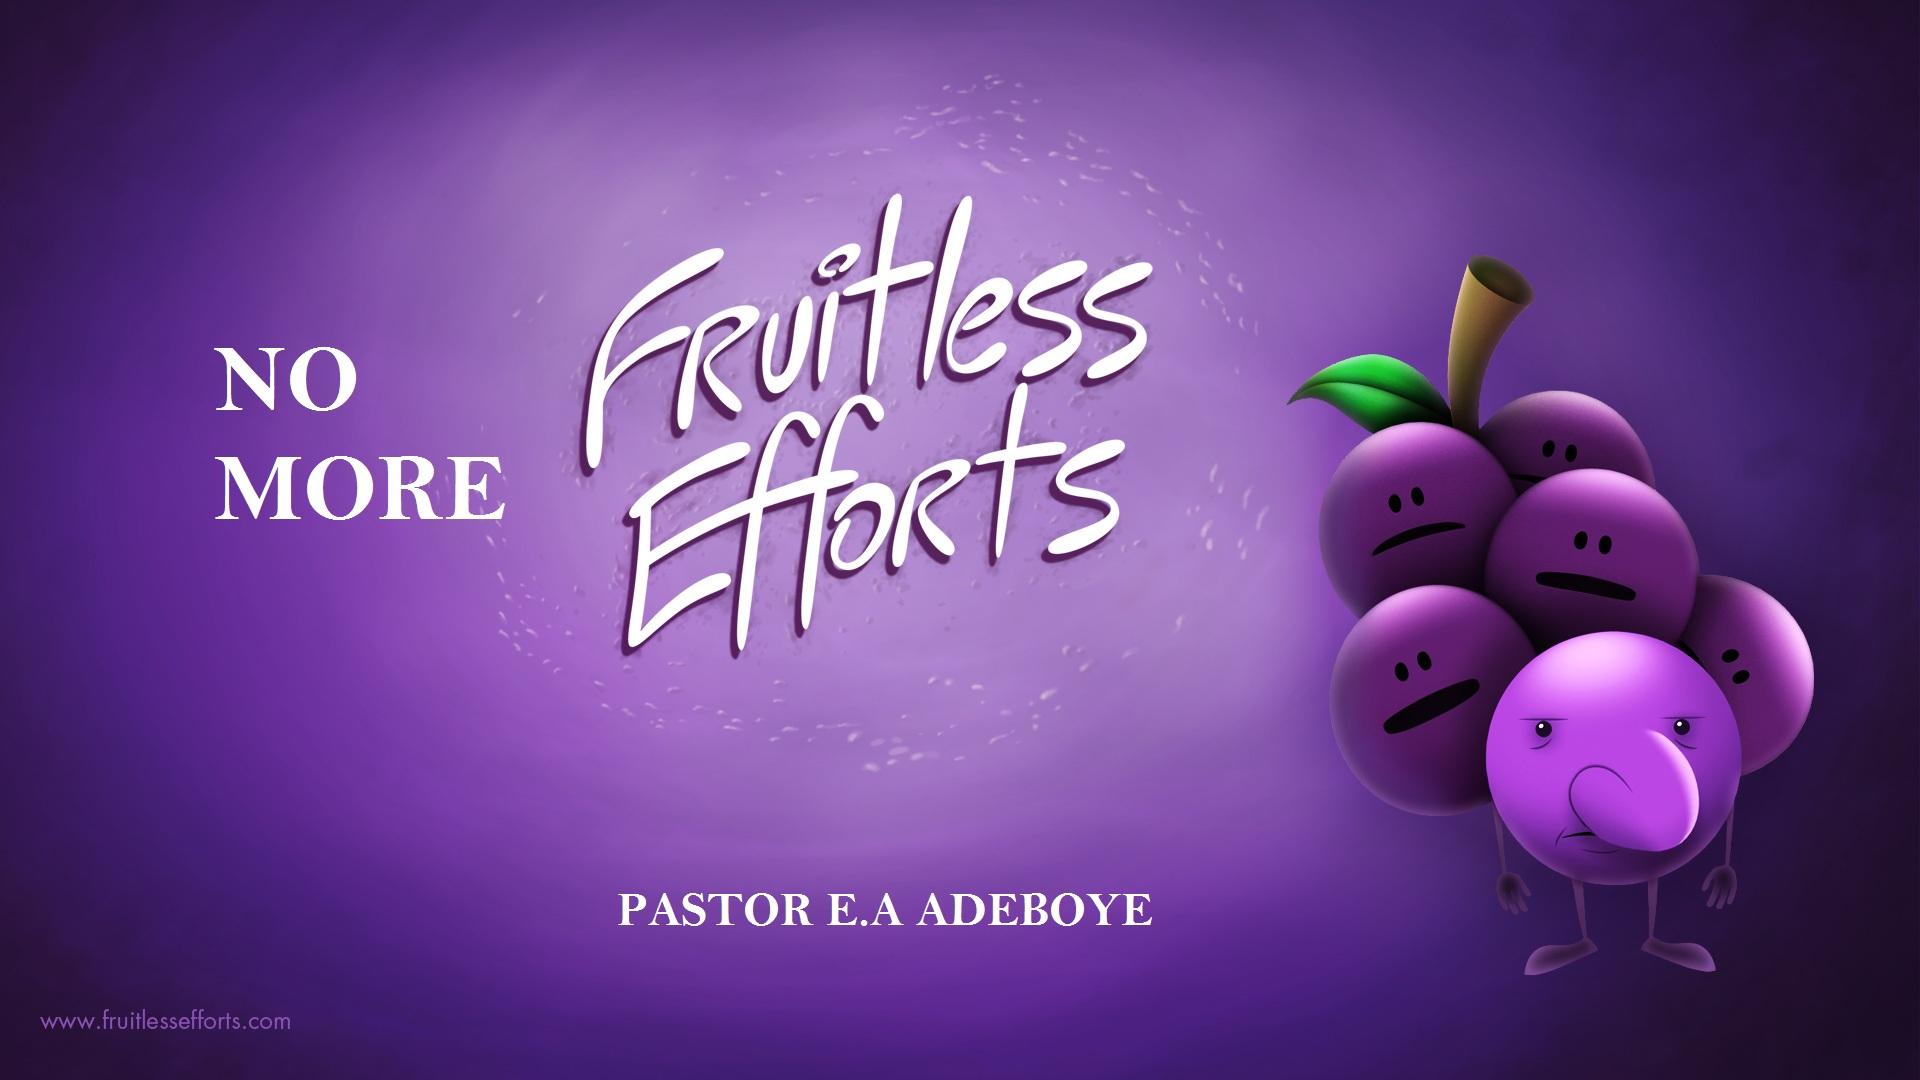 NO MORE Fruitless Efforts